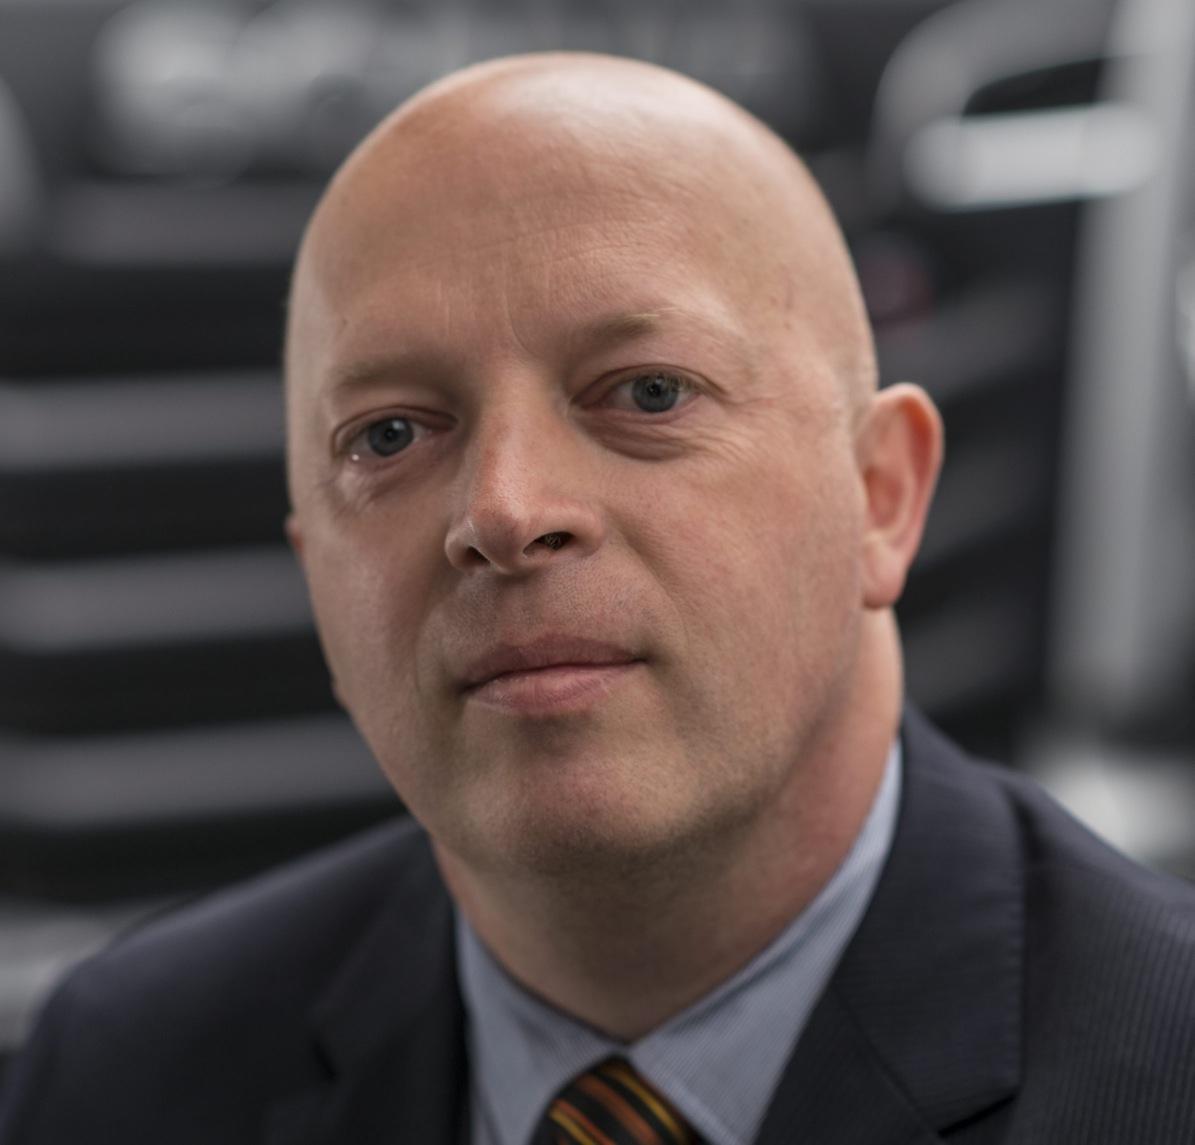 Koen Knoops, Senior Vice President, Financial Services. Photo: Dan Boman 2014